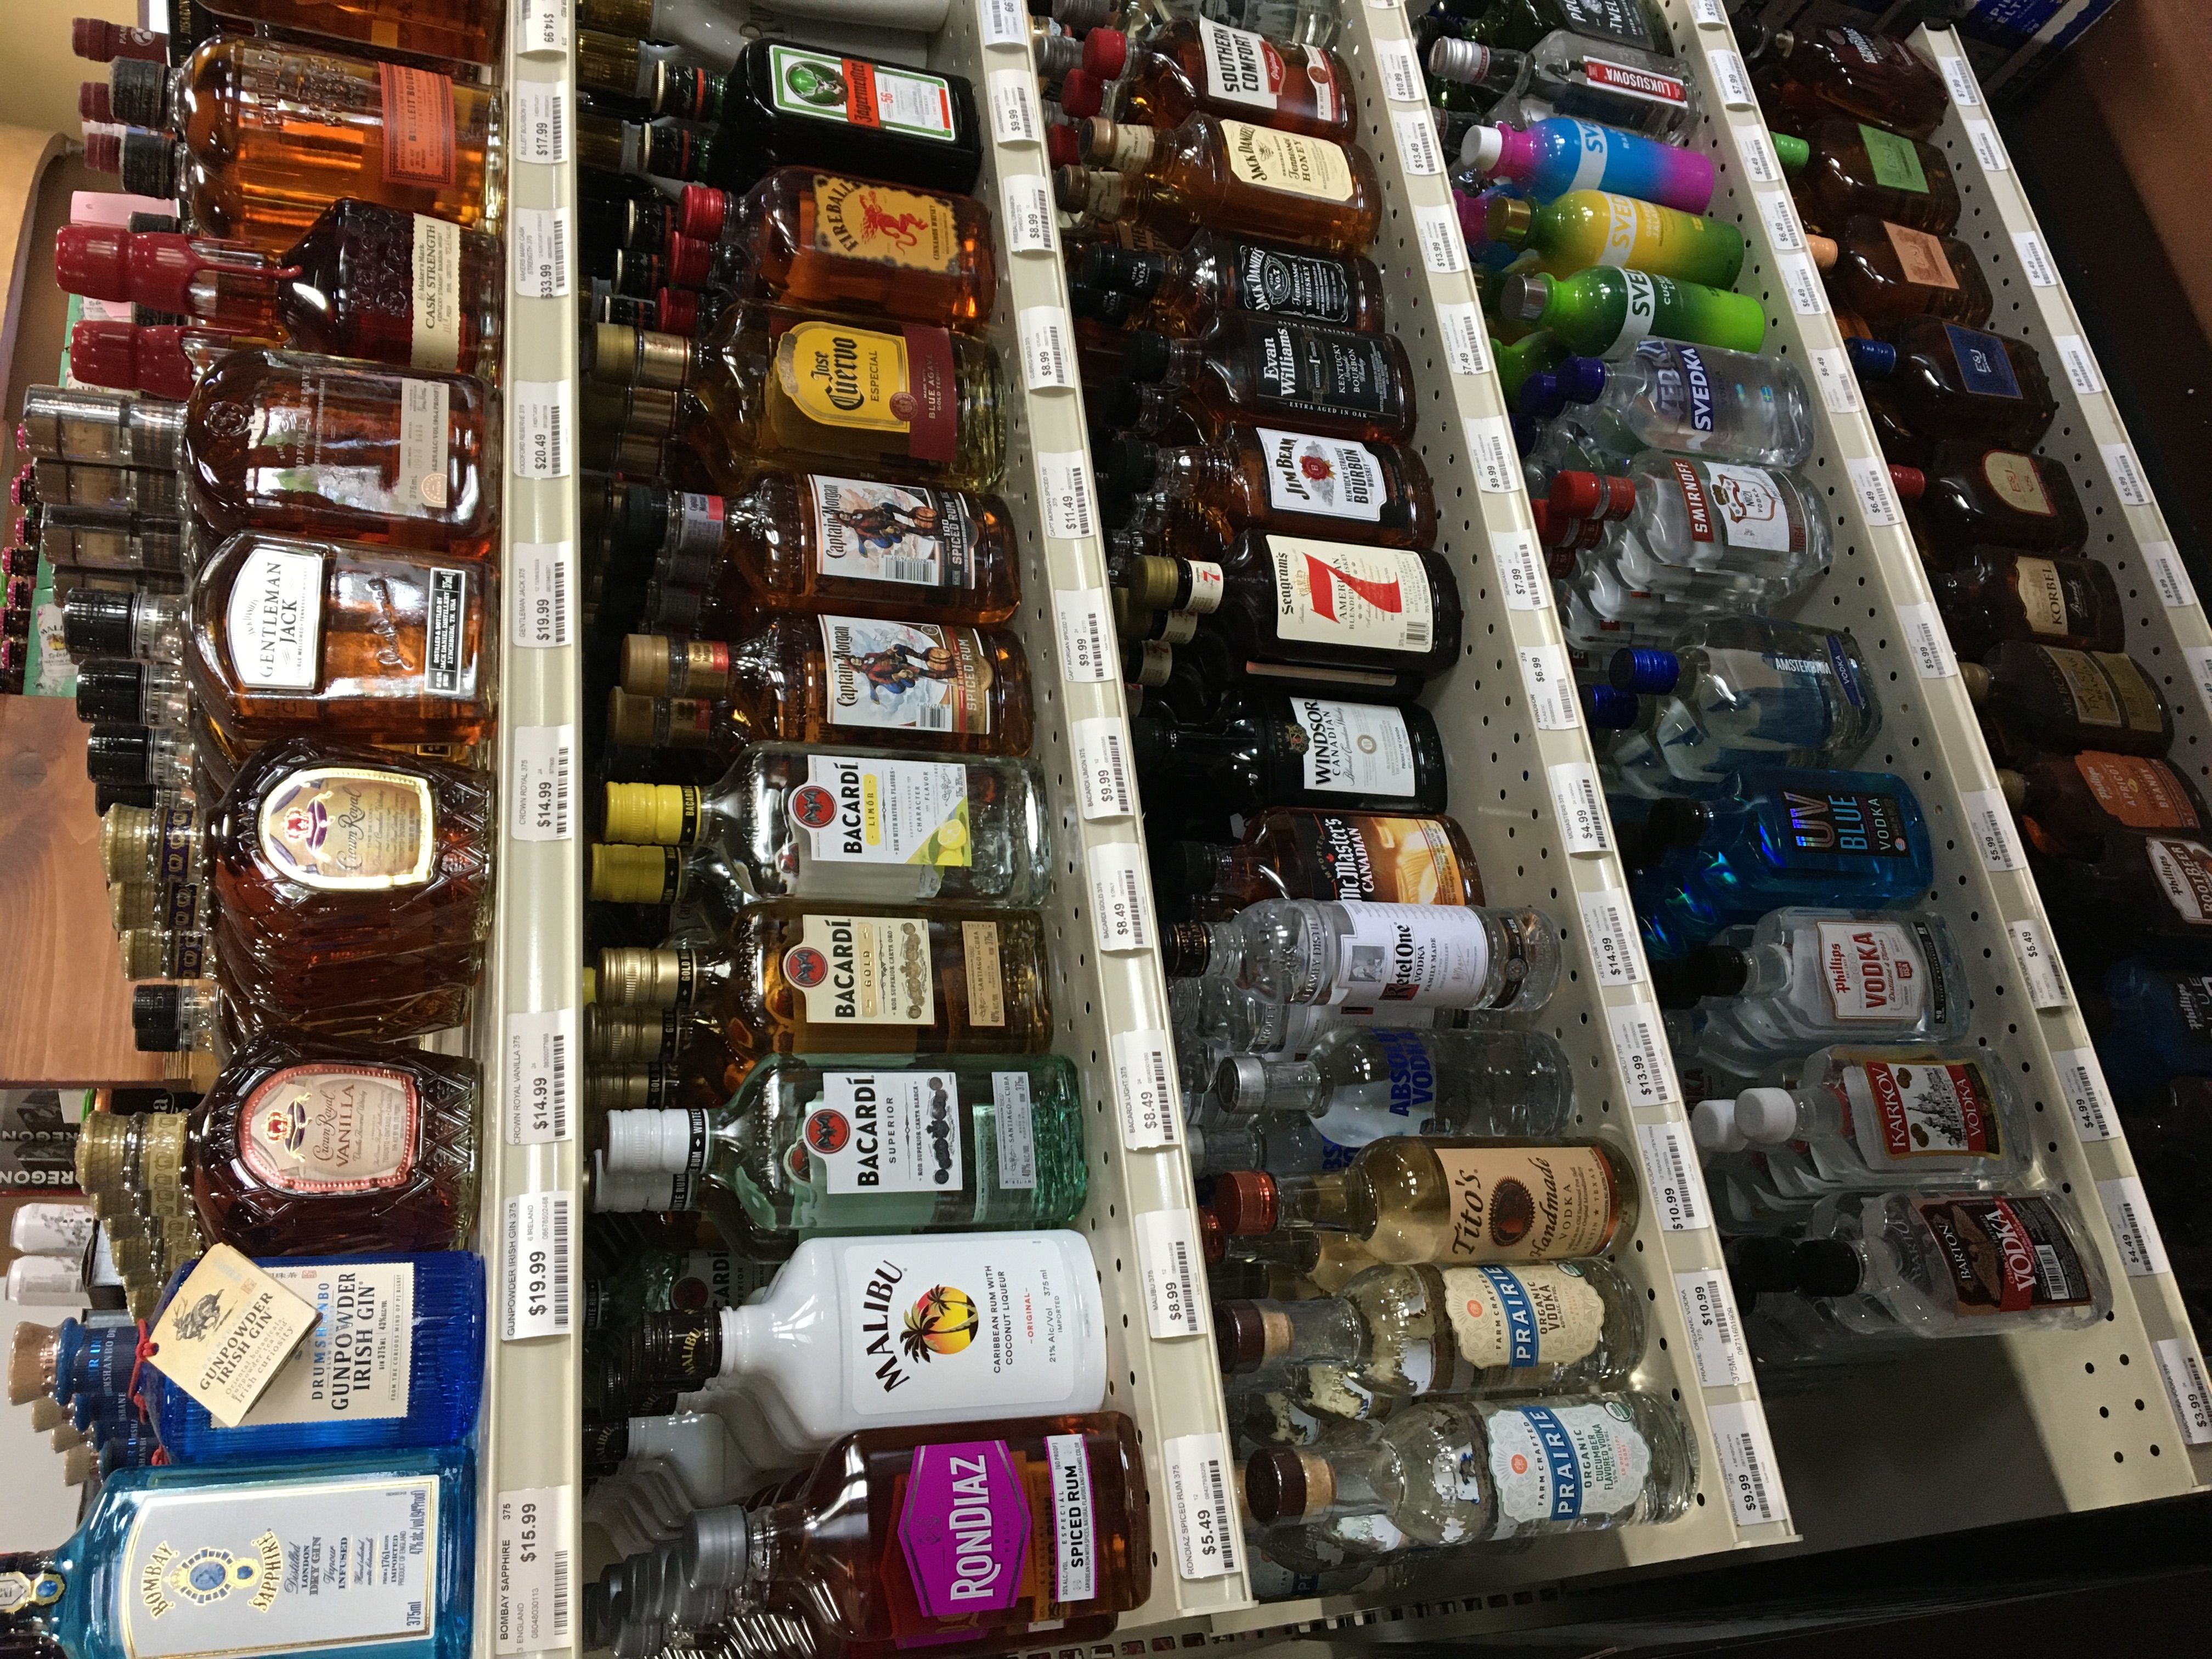 Small Size Liquor